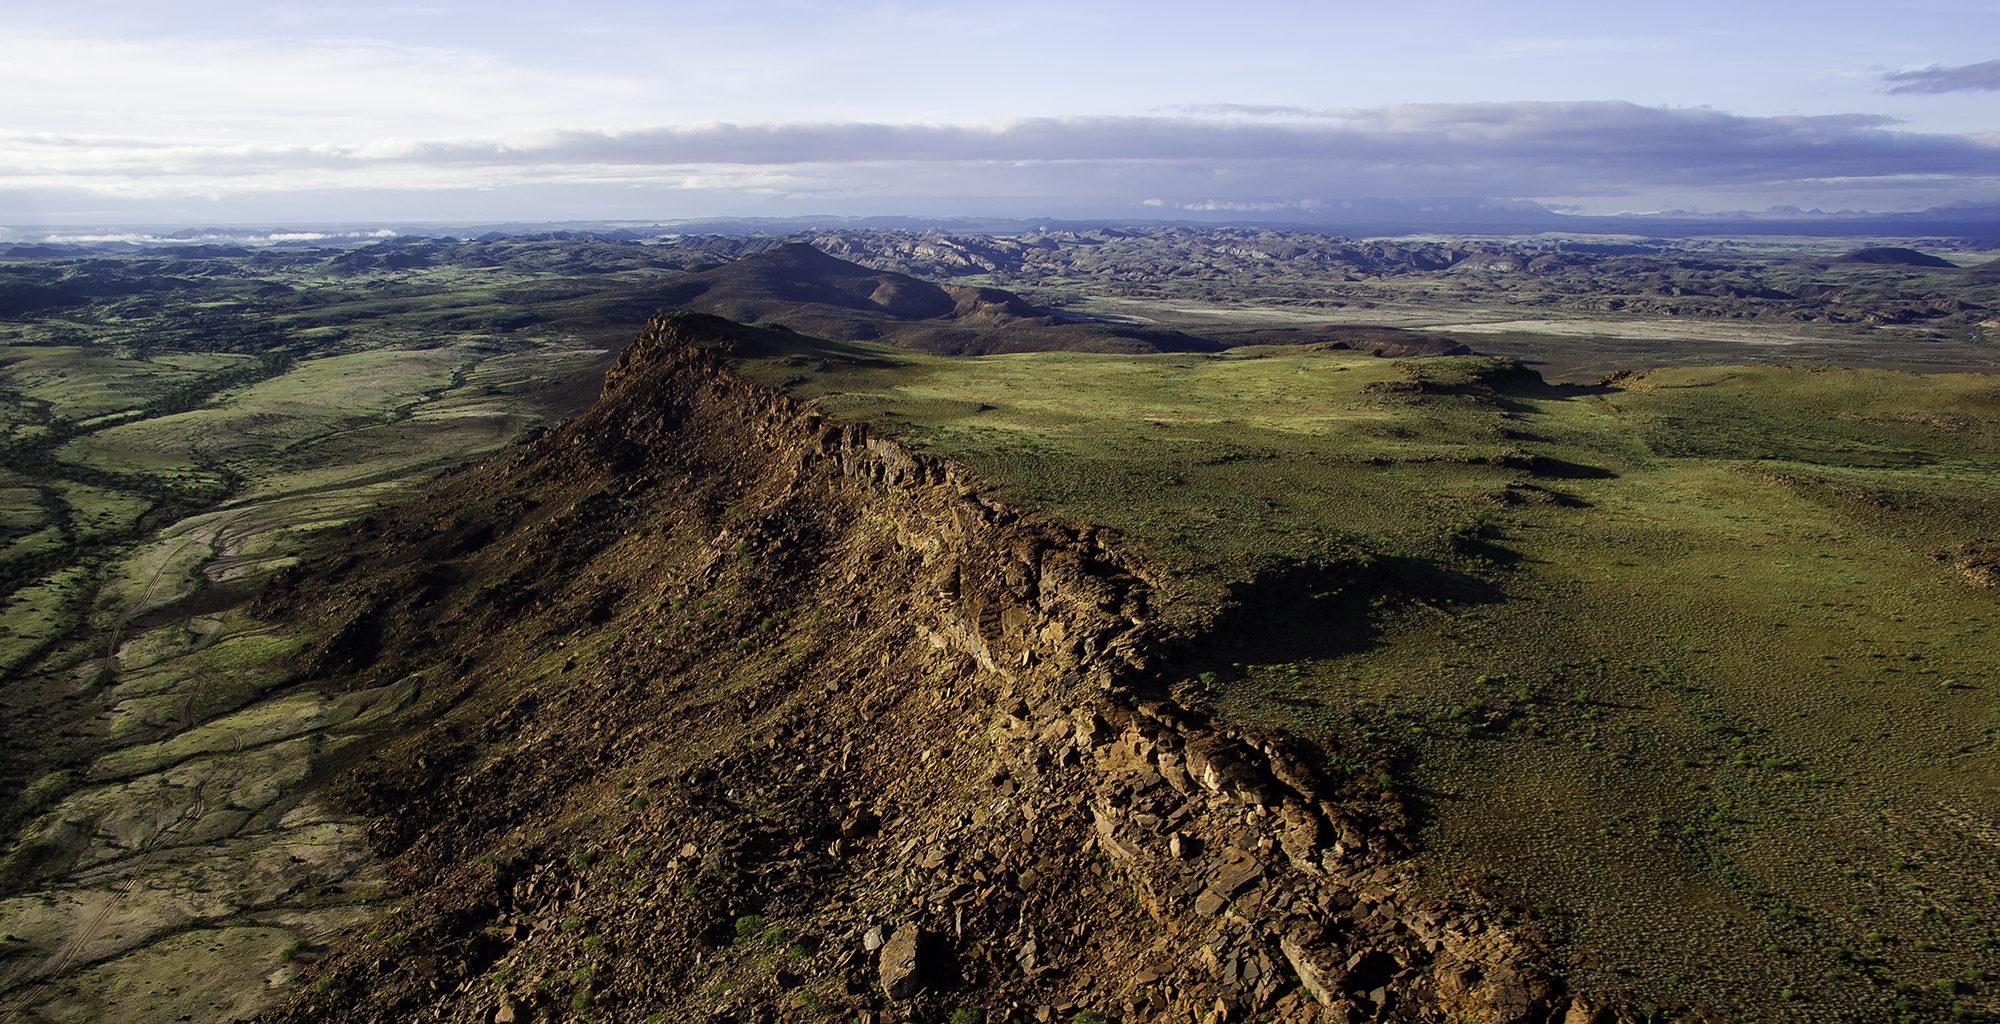 Namibia-Damaraland-Valley